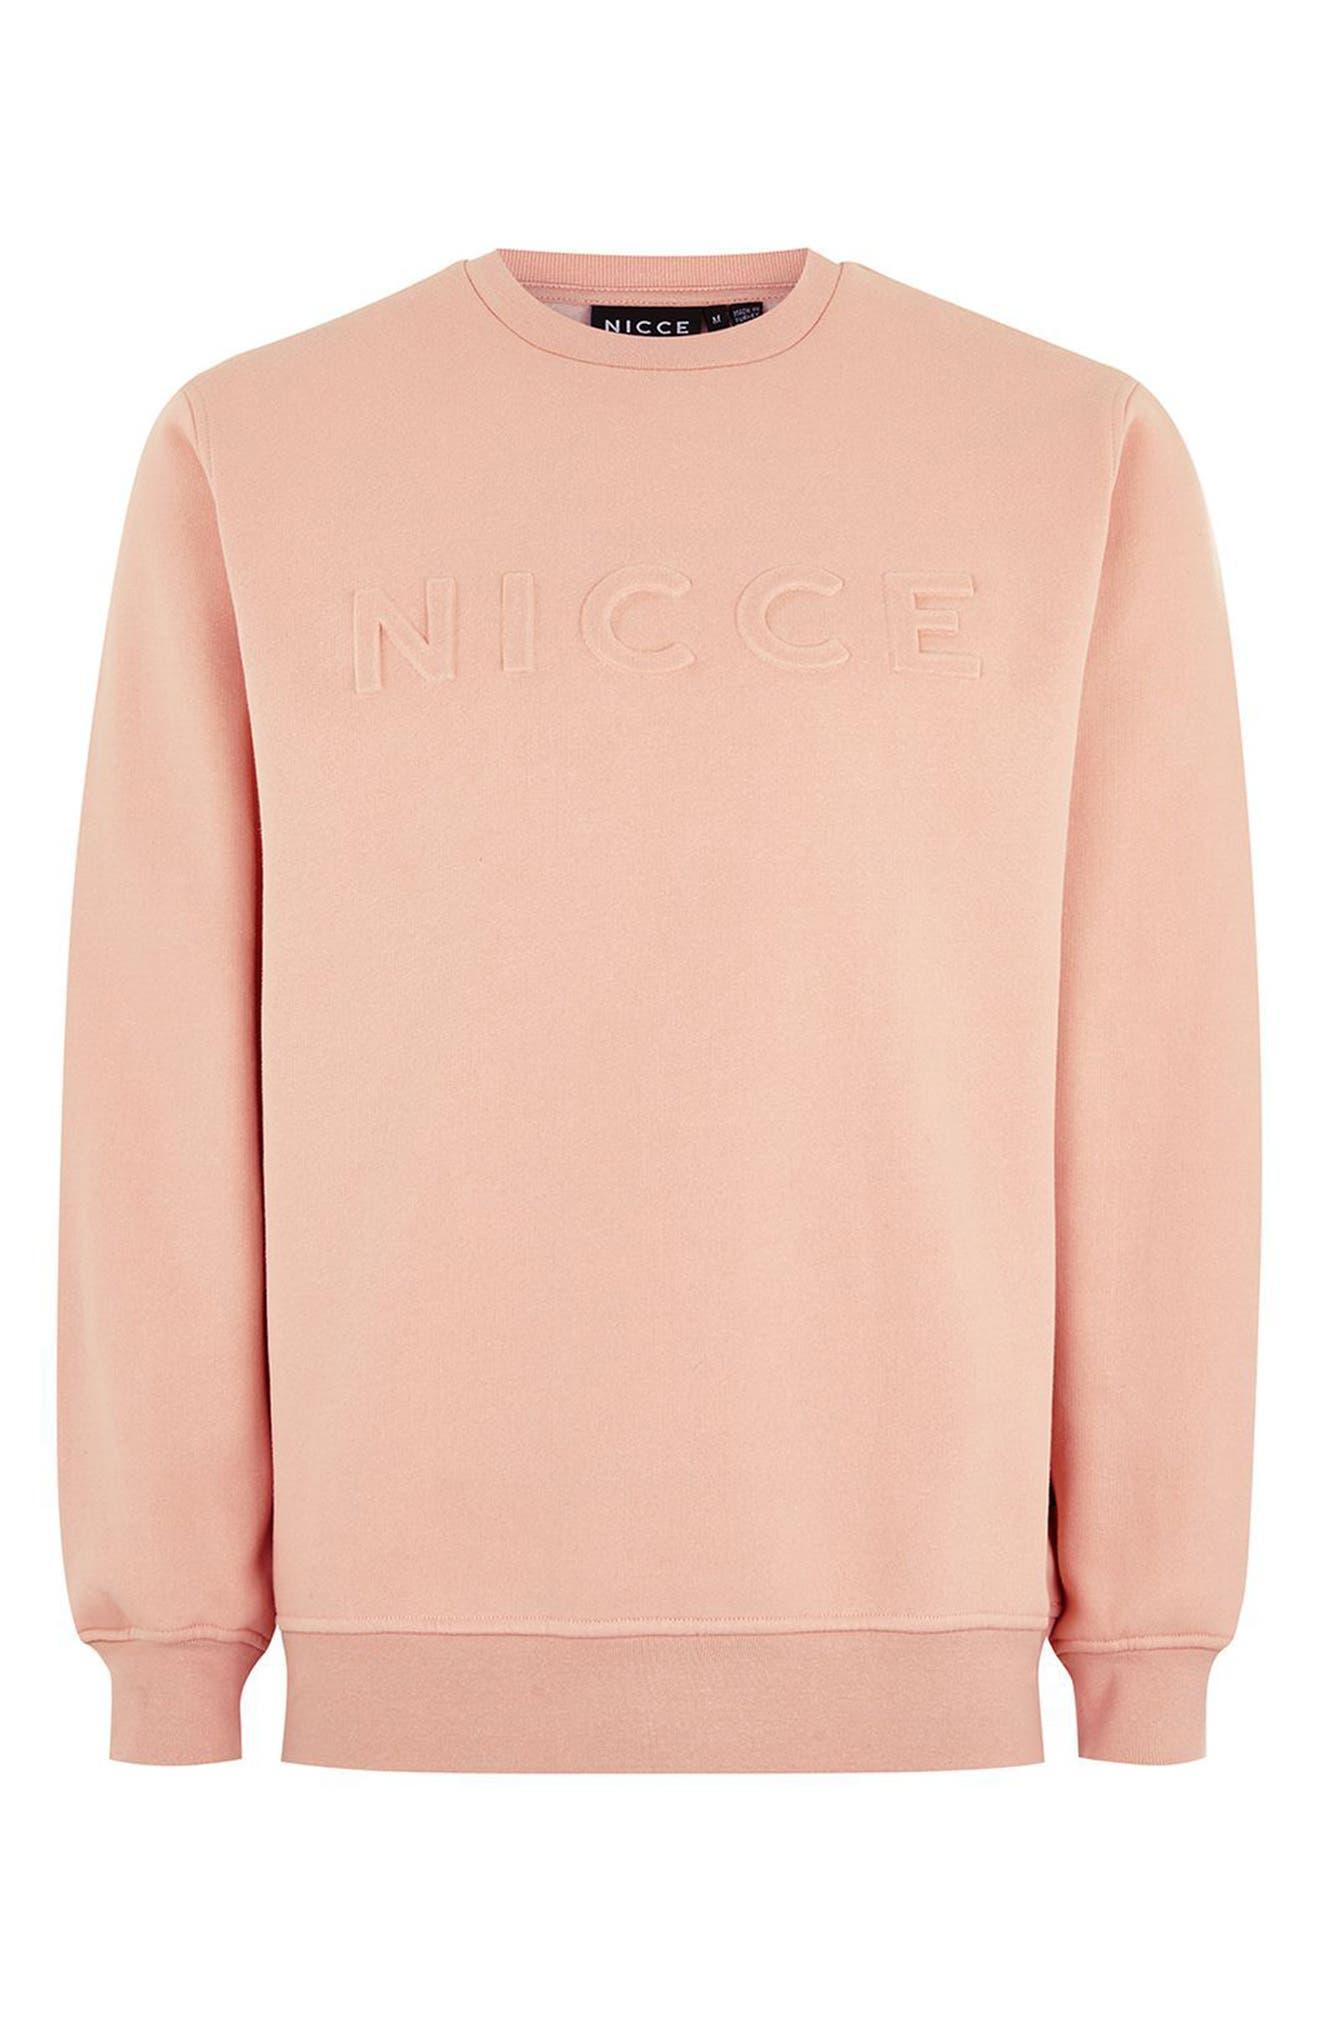 NICCE Slim Fit Embossed Sweatshirt,                             Alternate thumbnail 4, color,                             650